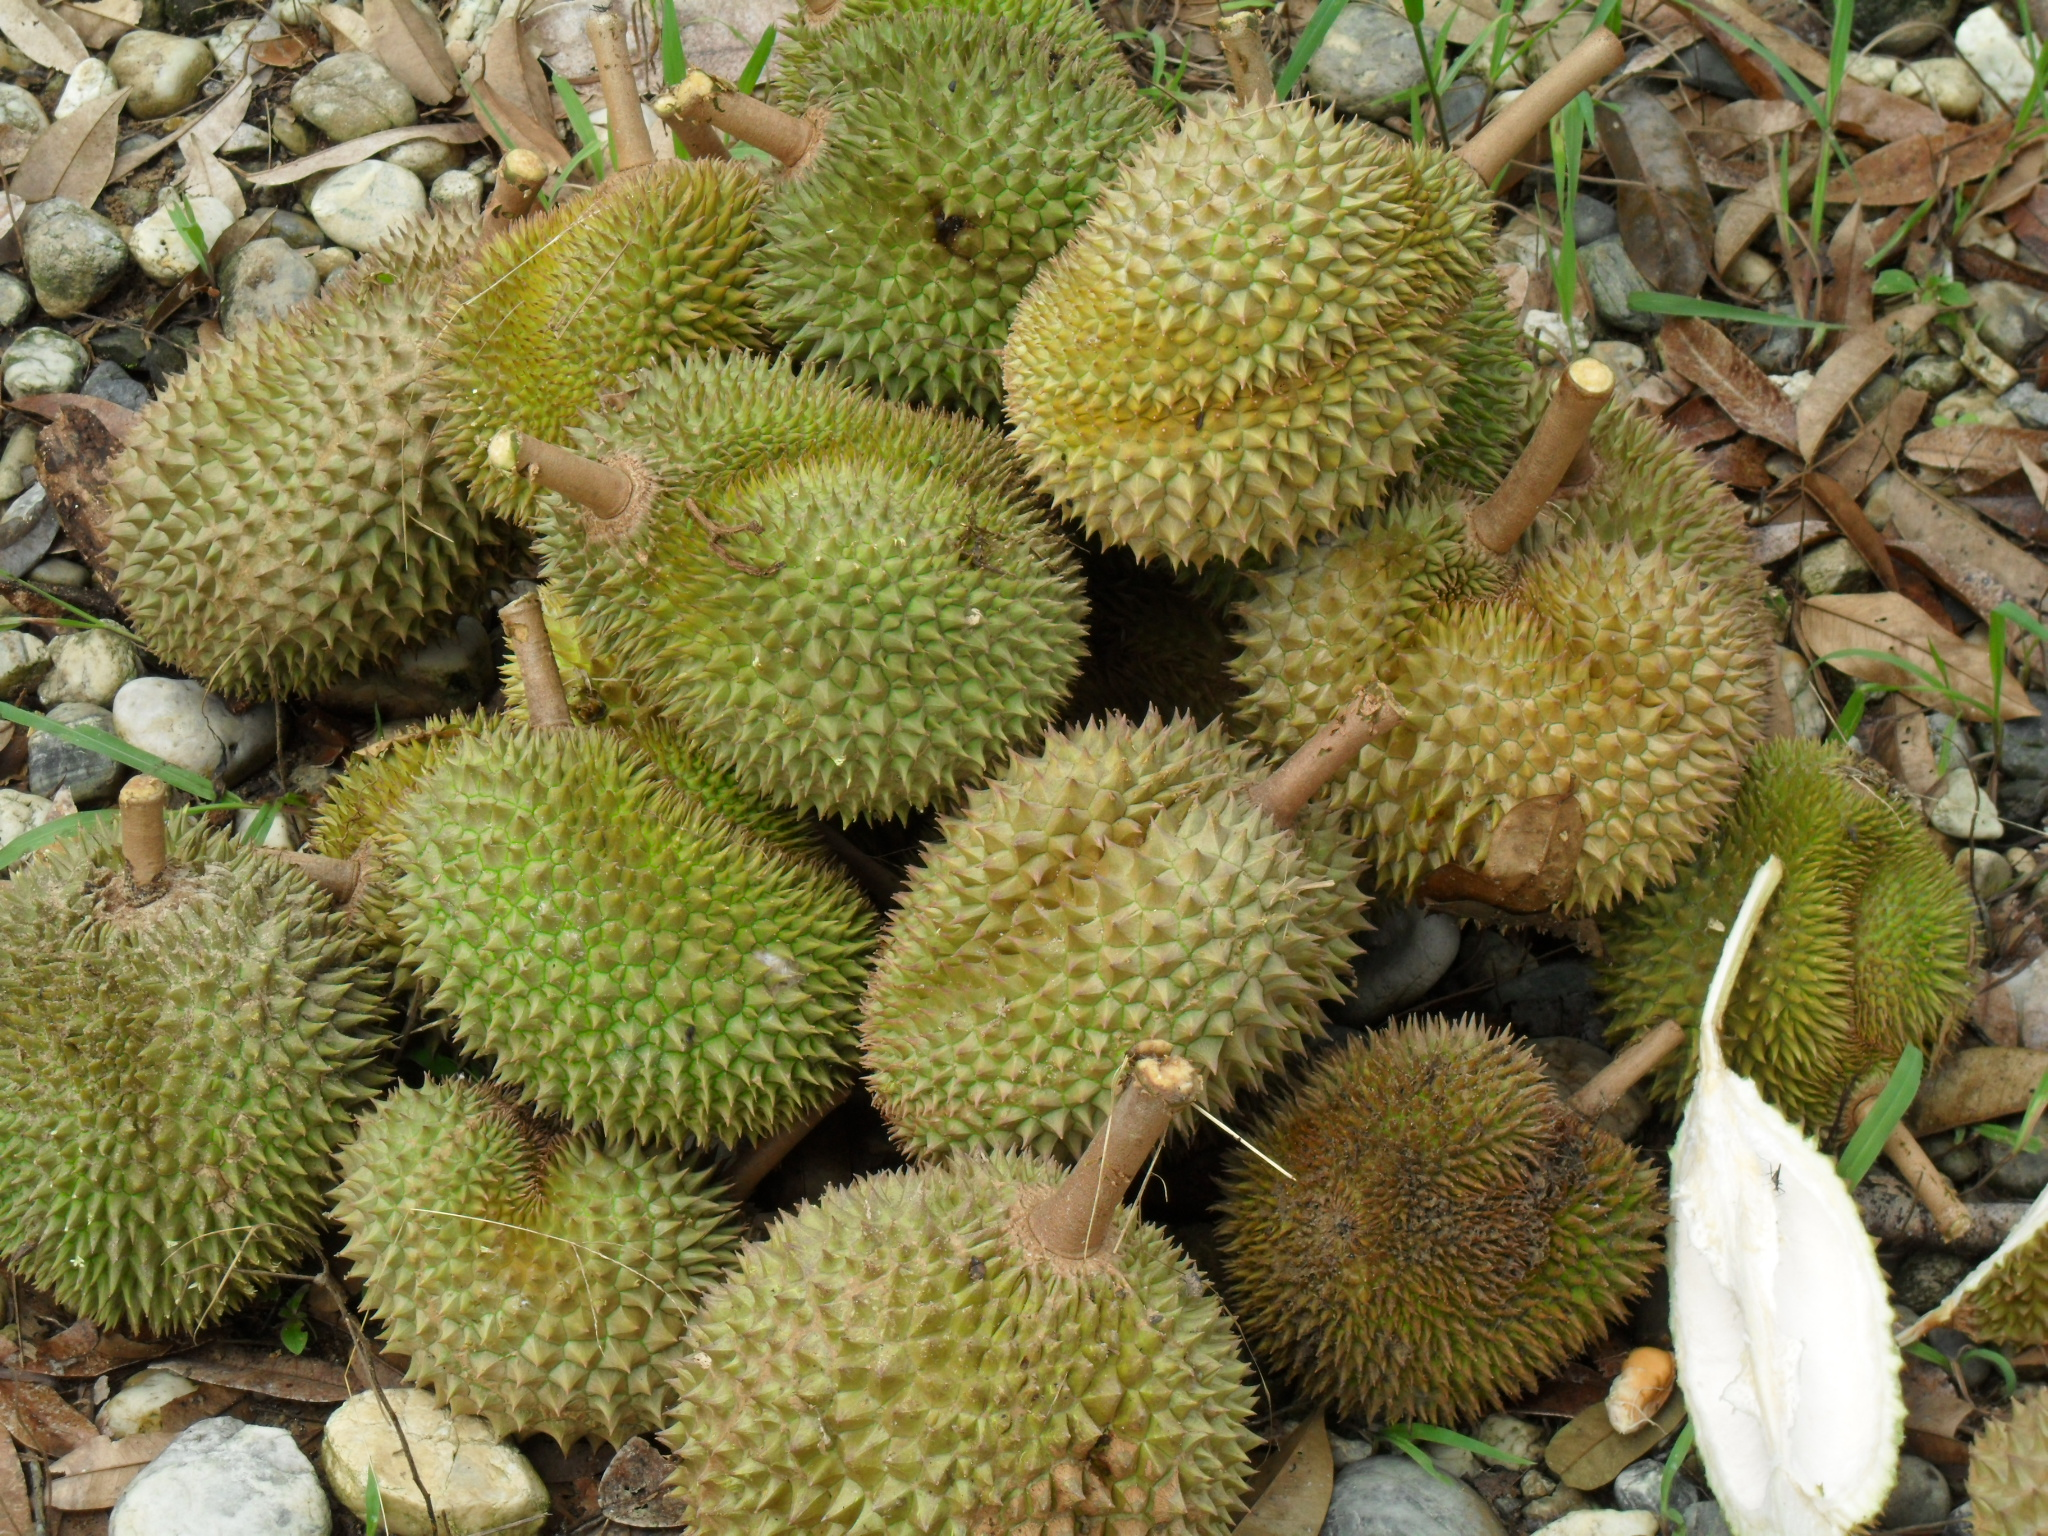 durian orchards signposts. Black Bedroom Furniture Sets. Home Design Ideas